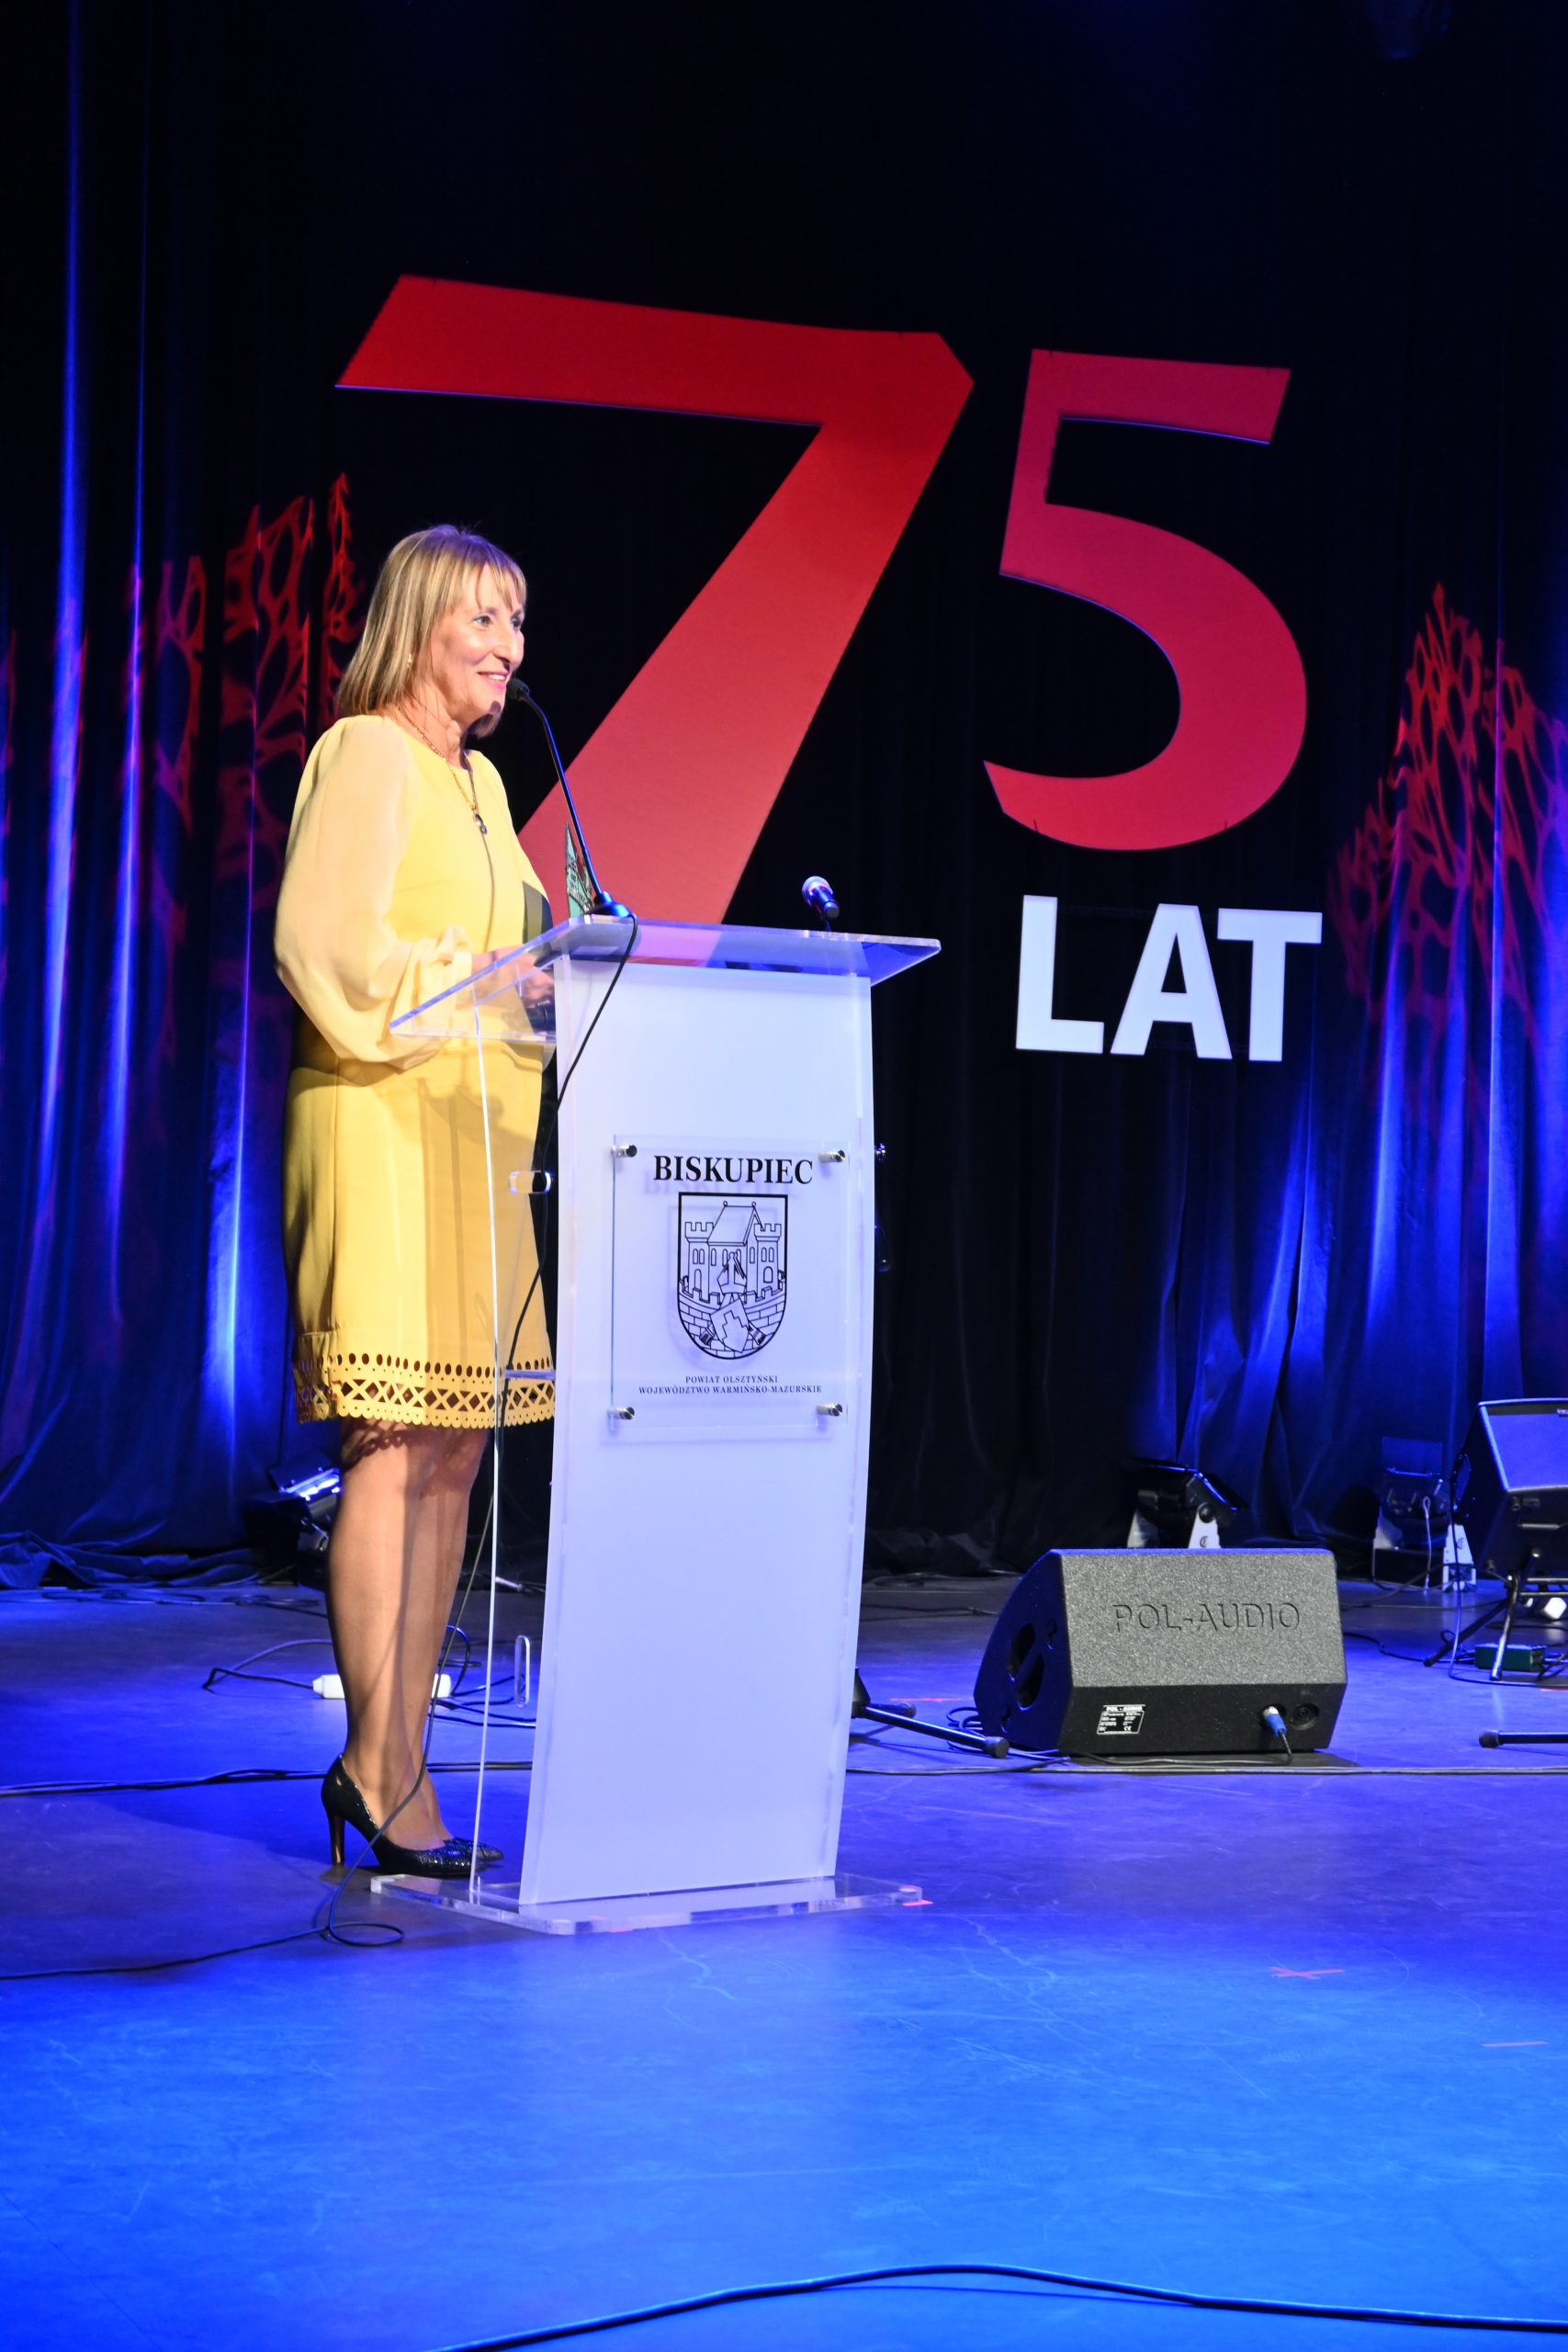 Dyrektor Biblioteki Alicja Kosewska Terech